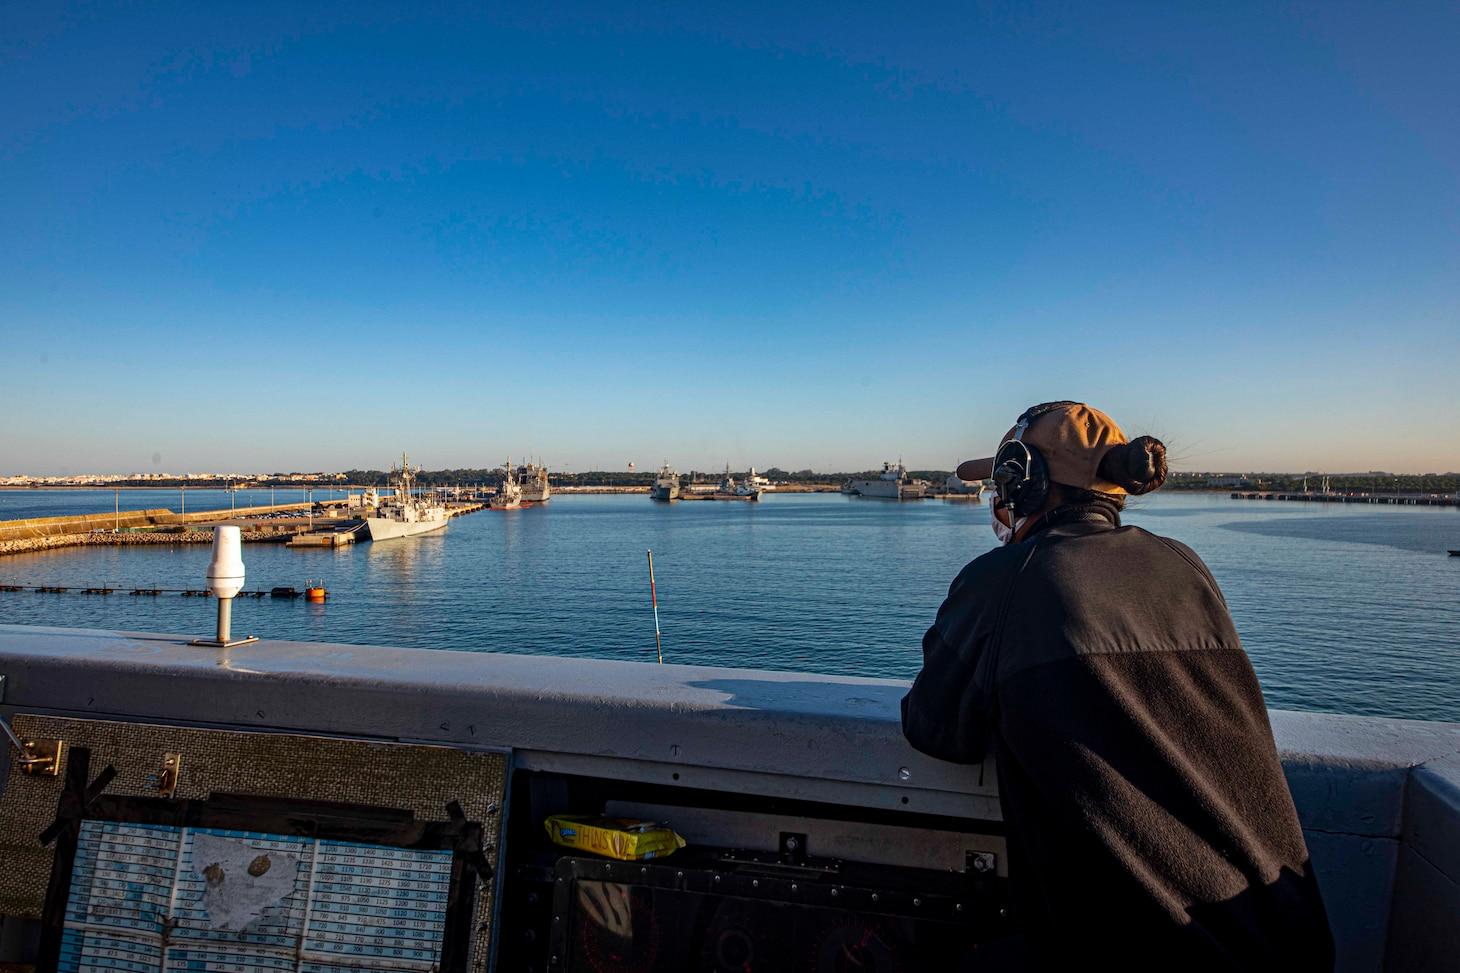 San Antonio-class amphibious transport dock ship USS New York (LPD